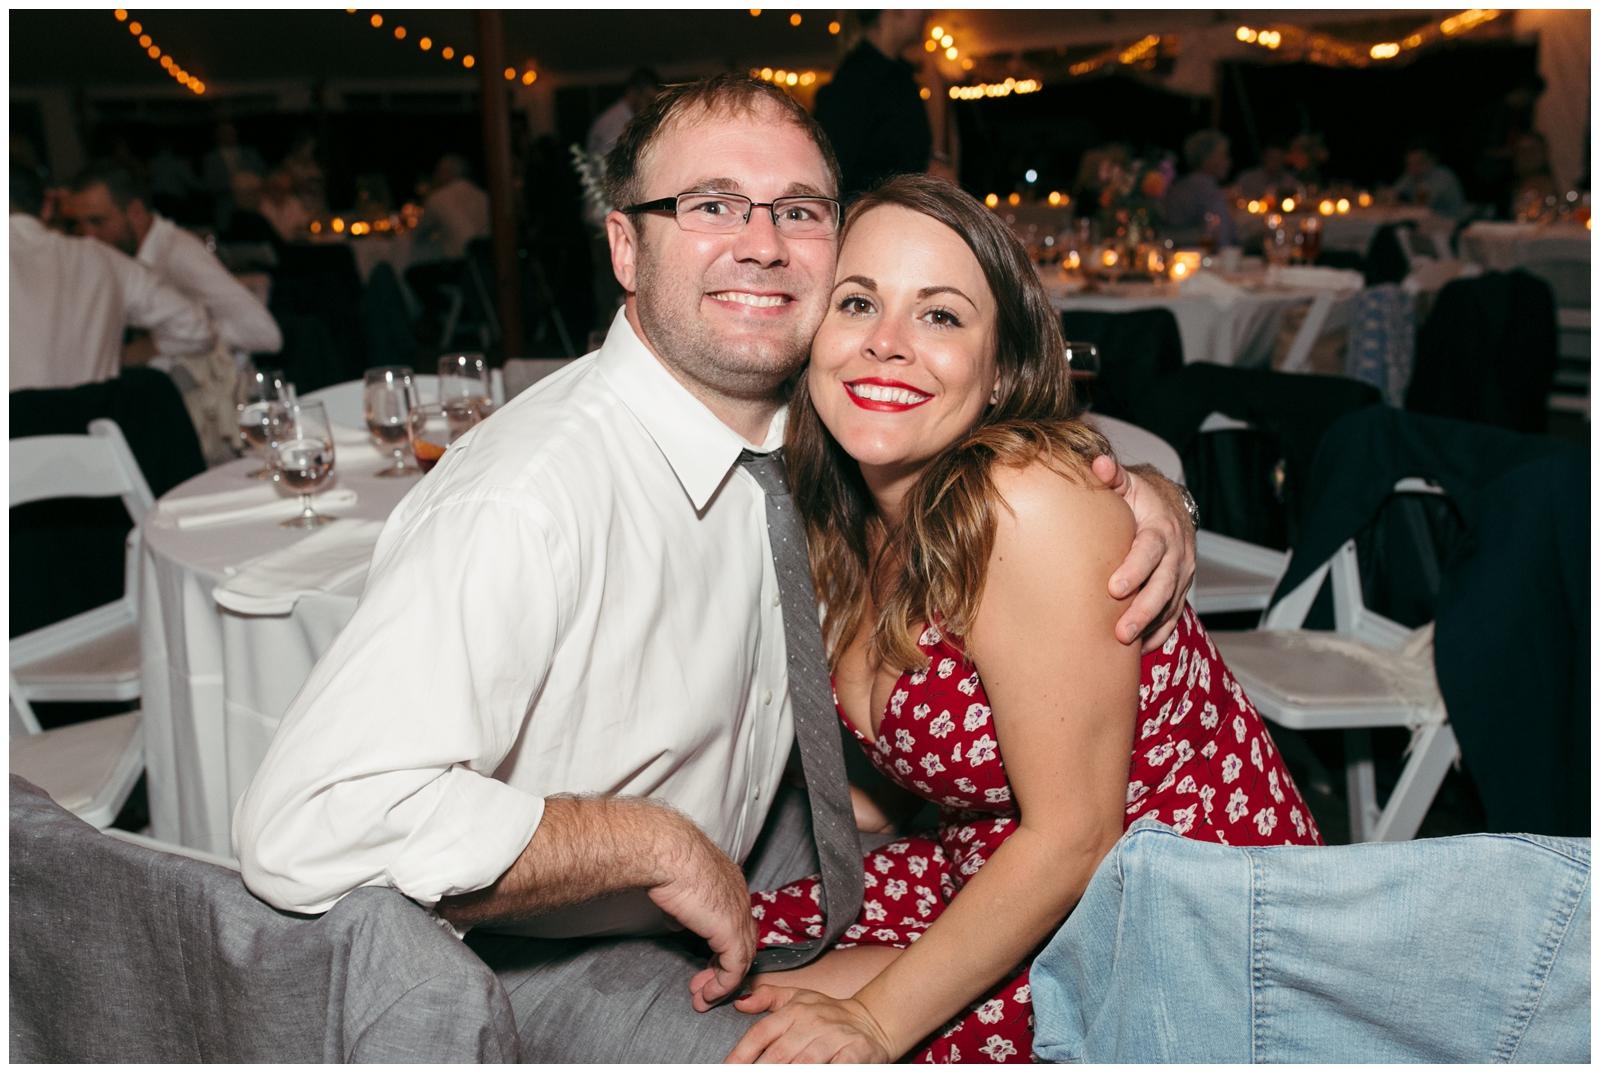 Moraine-Farm-wedding-Bailey-Q-Photo-Massachusetts-wedding-photpgrapher-149.jpg